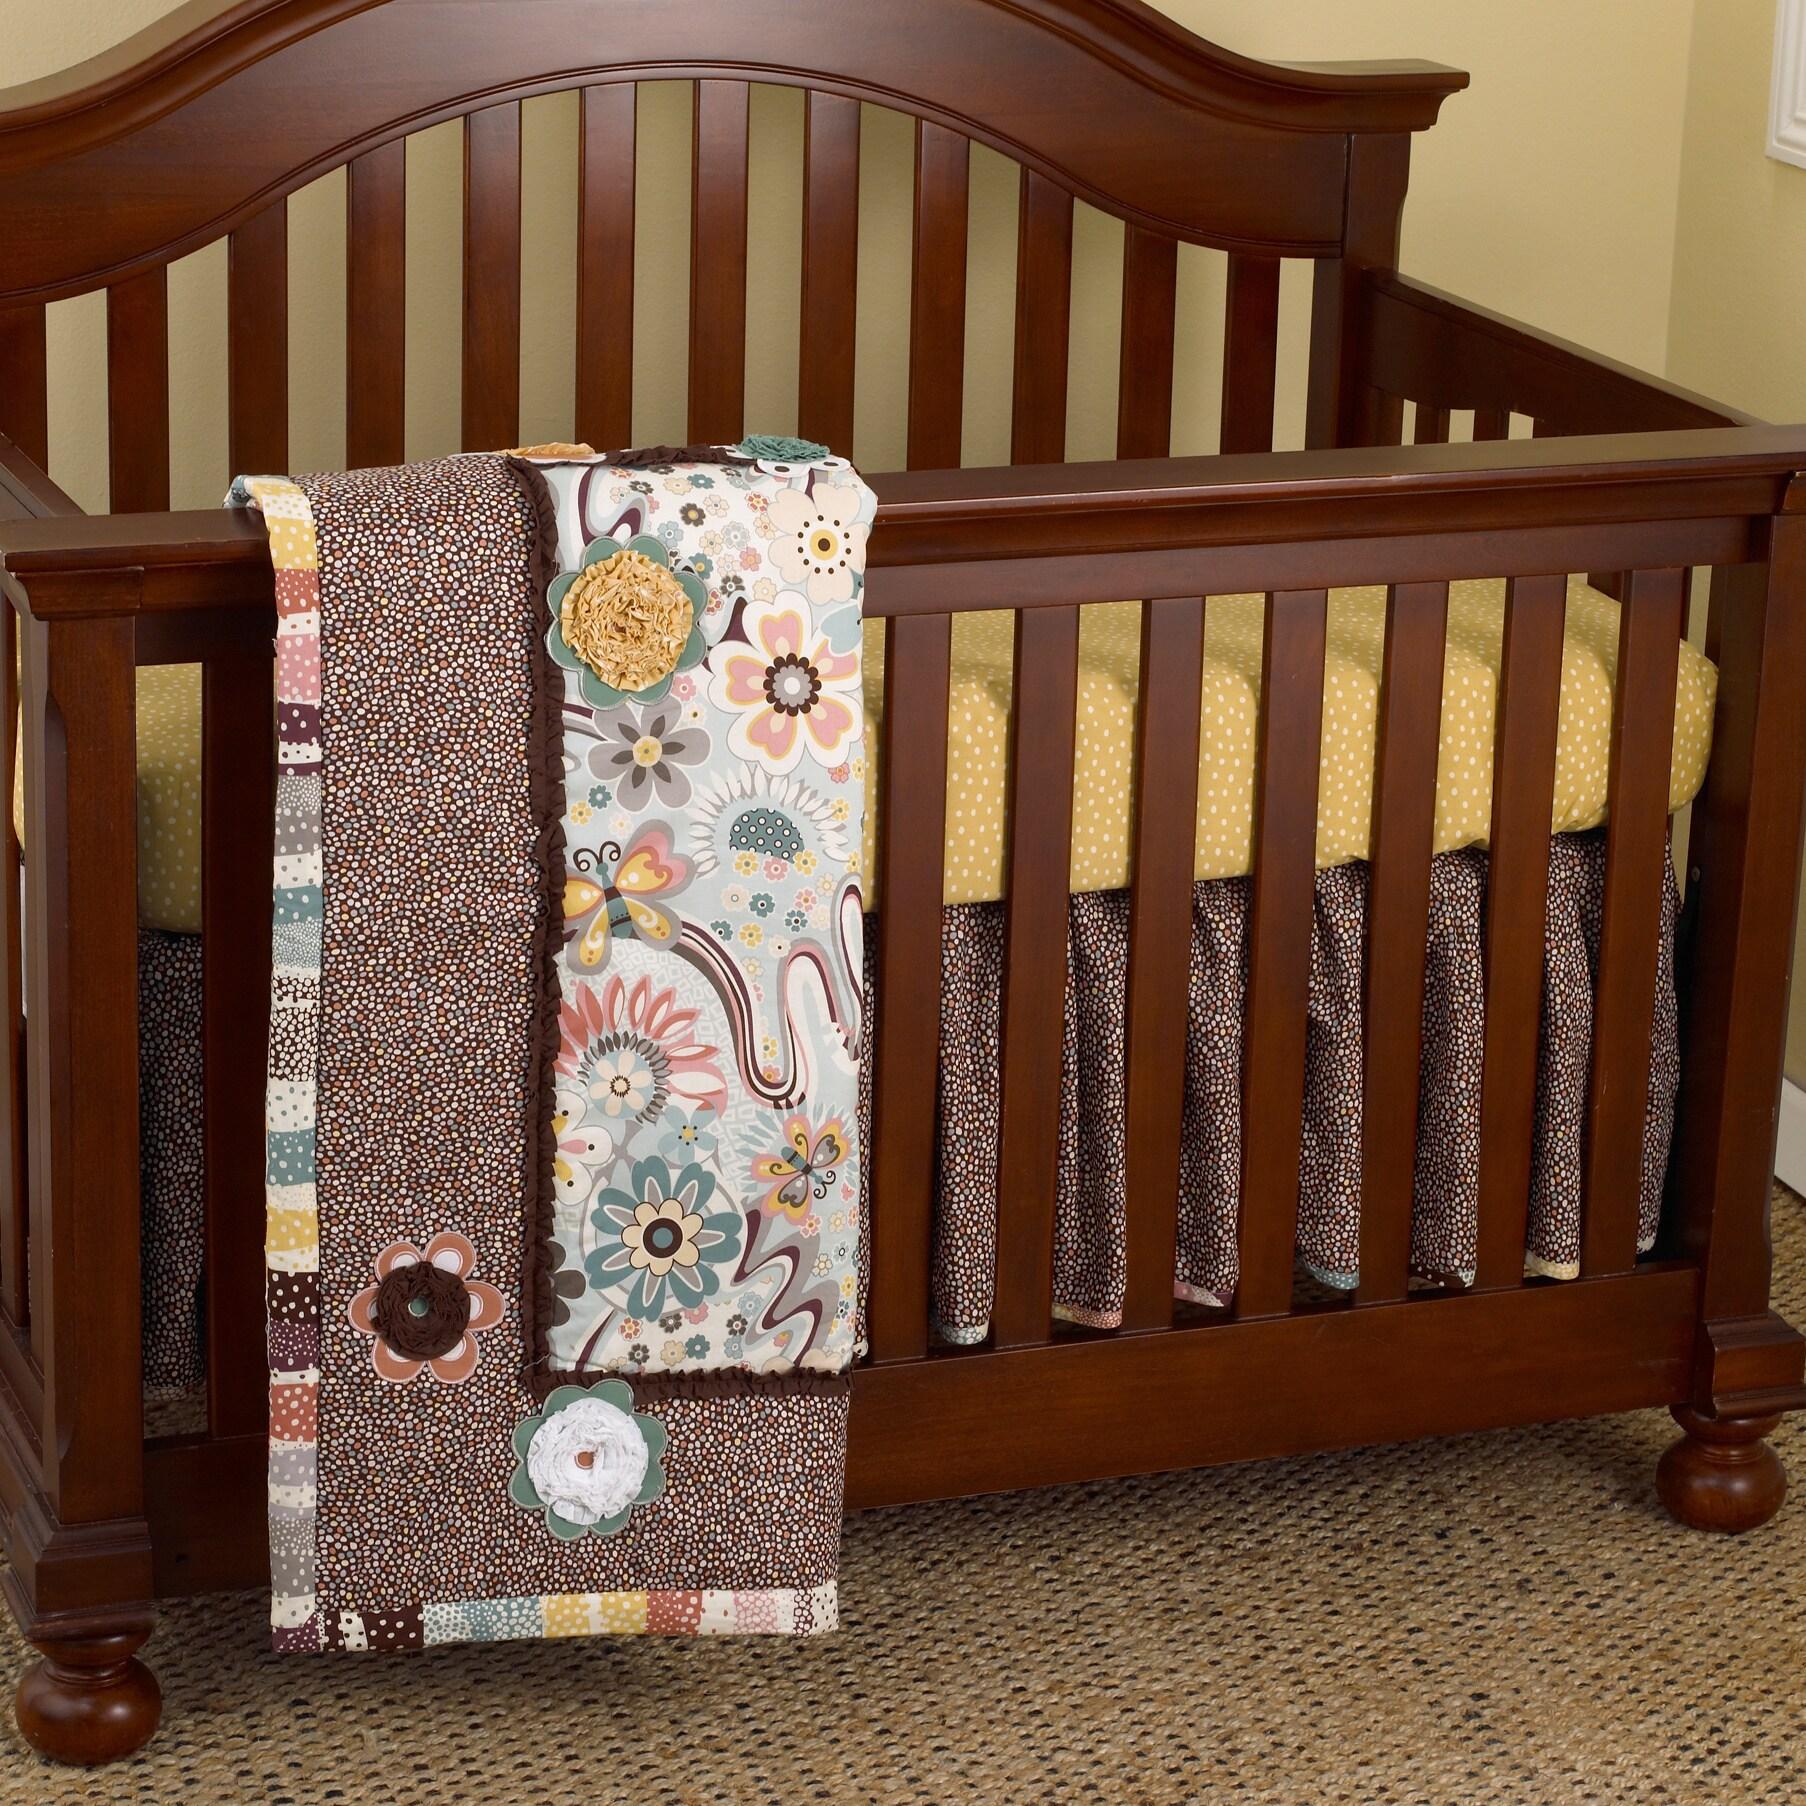 Cotton Tale Penny Lane 3-piece Crib Bedding Set (Cotton T...